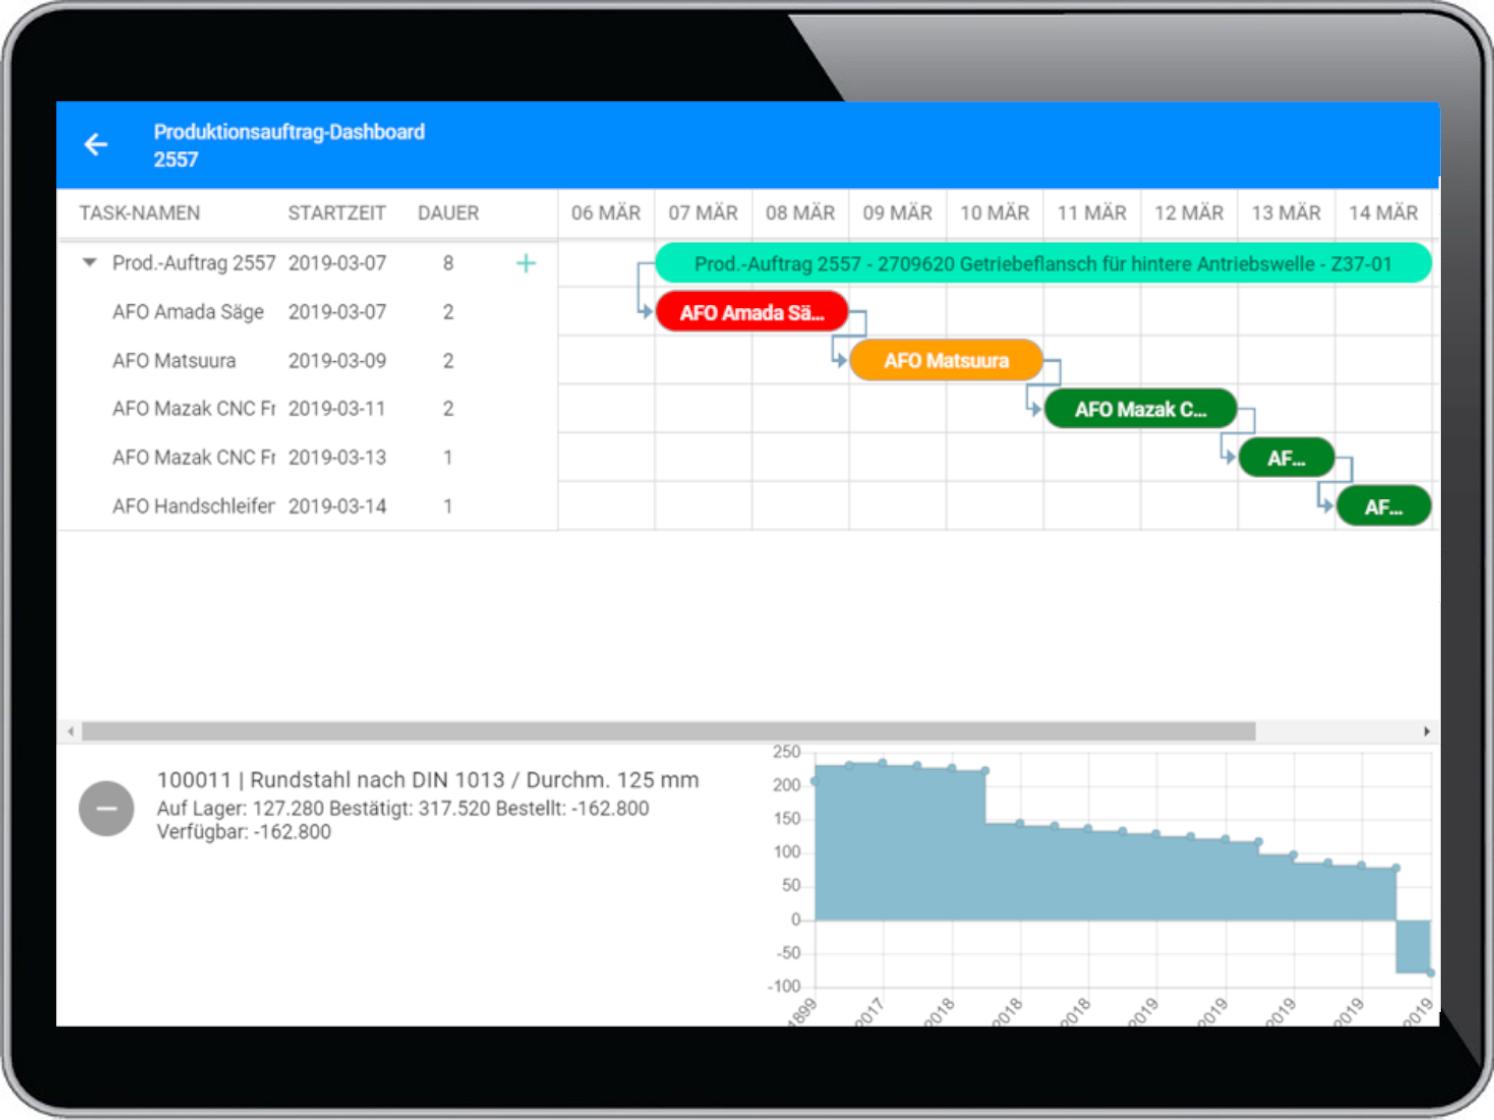 produktions-dashboard-tablet-neu